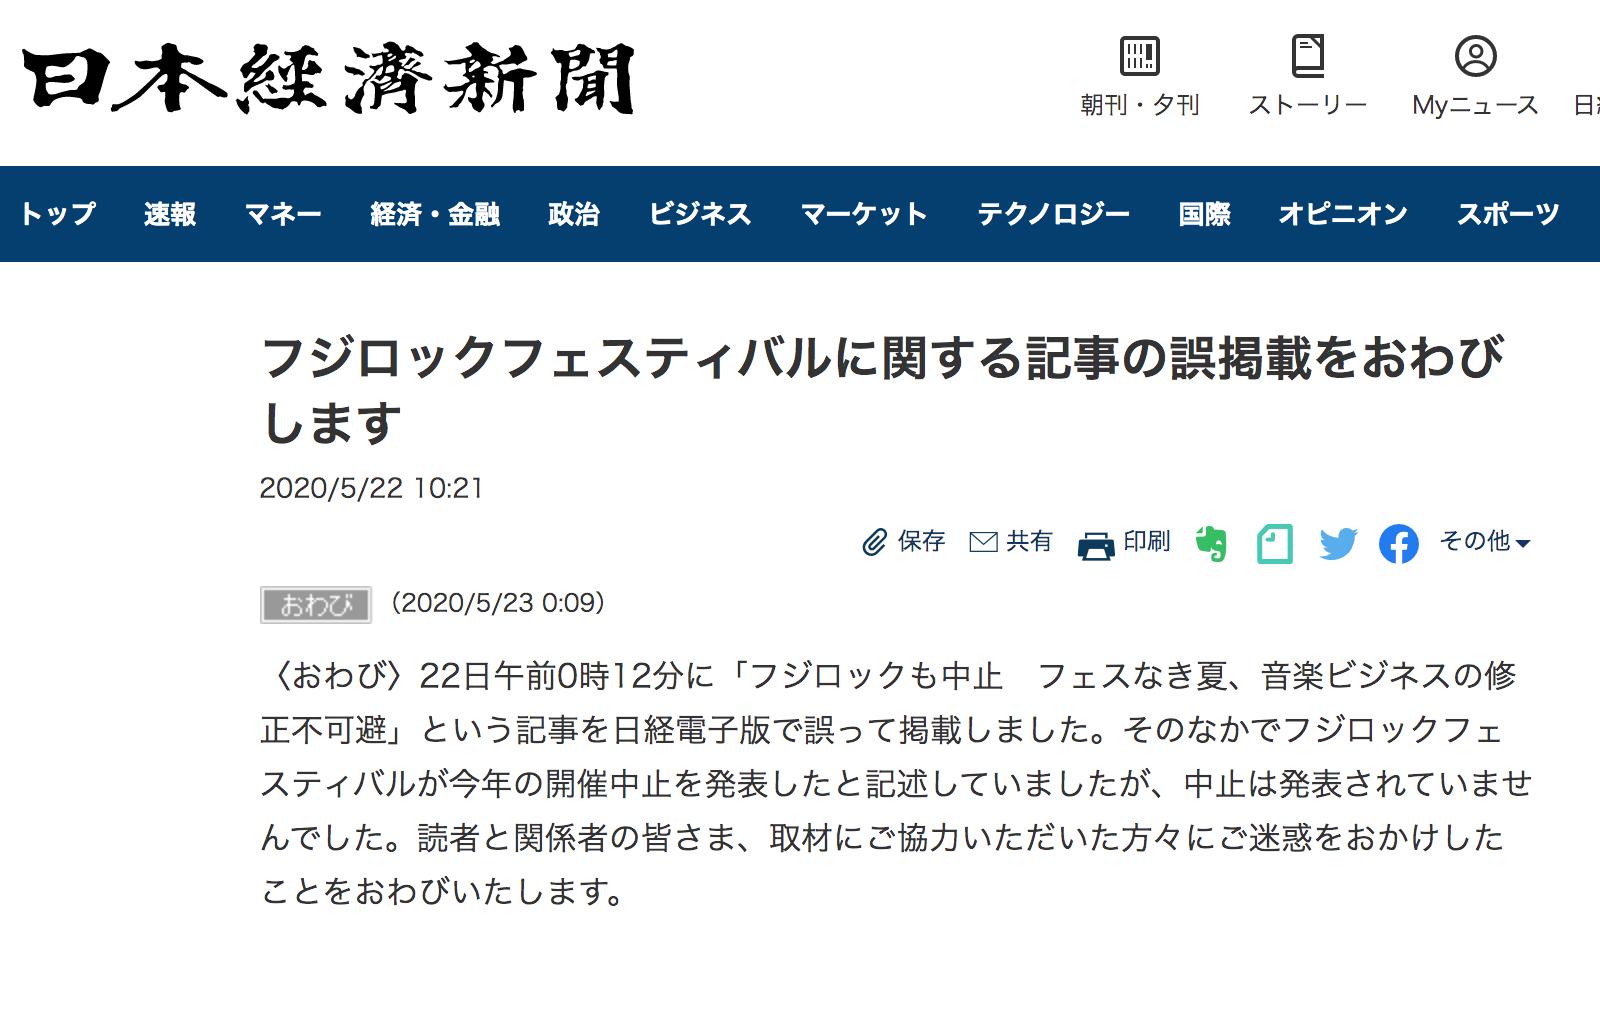 FUJI ROCK 取消?!《 日本經濟新聞 》發道歉聲明